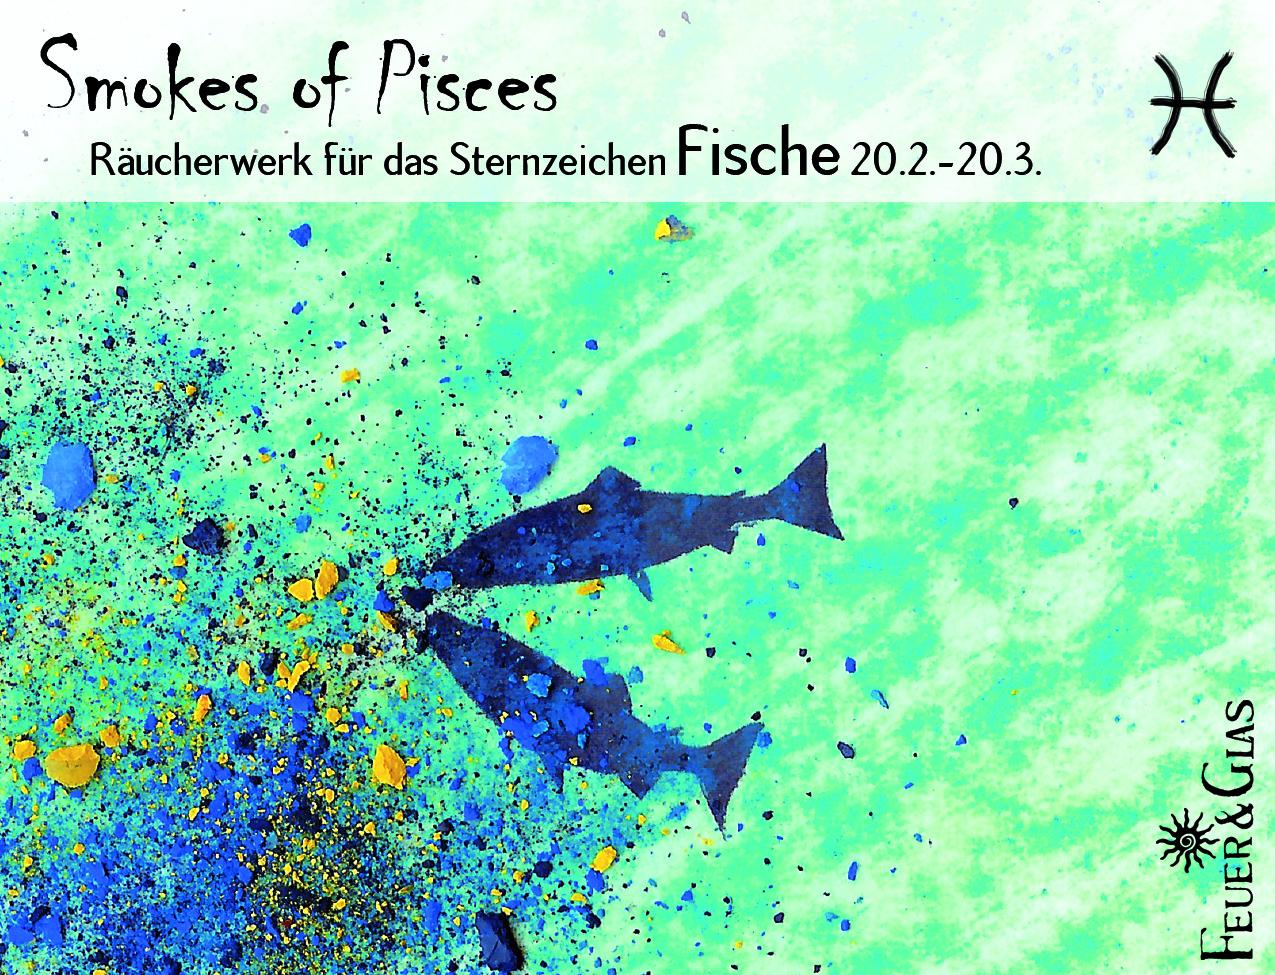 Smokes of Pisces - Fische